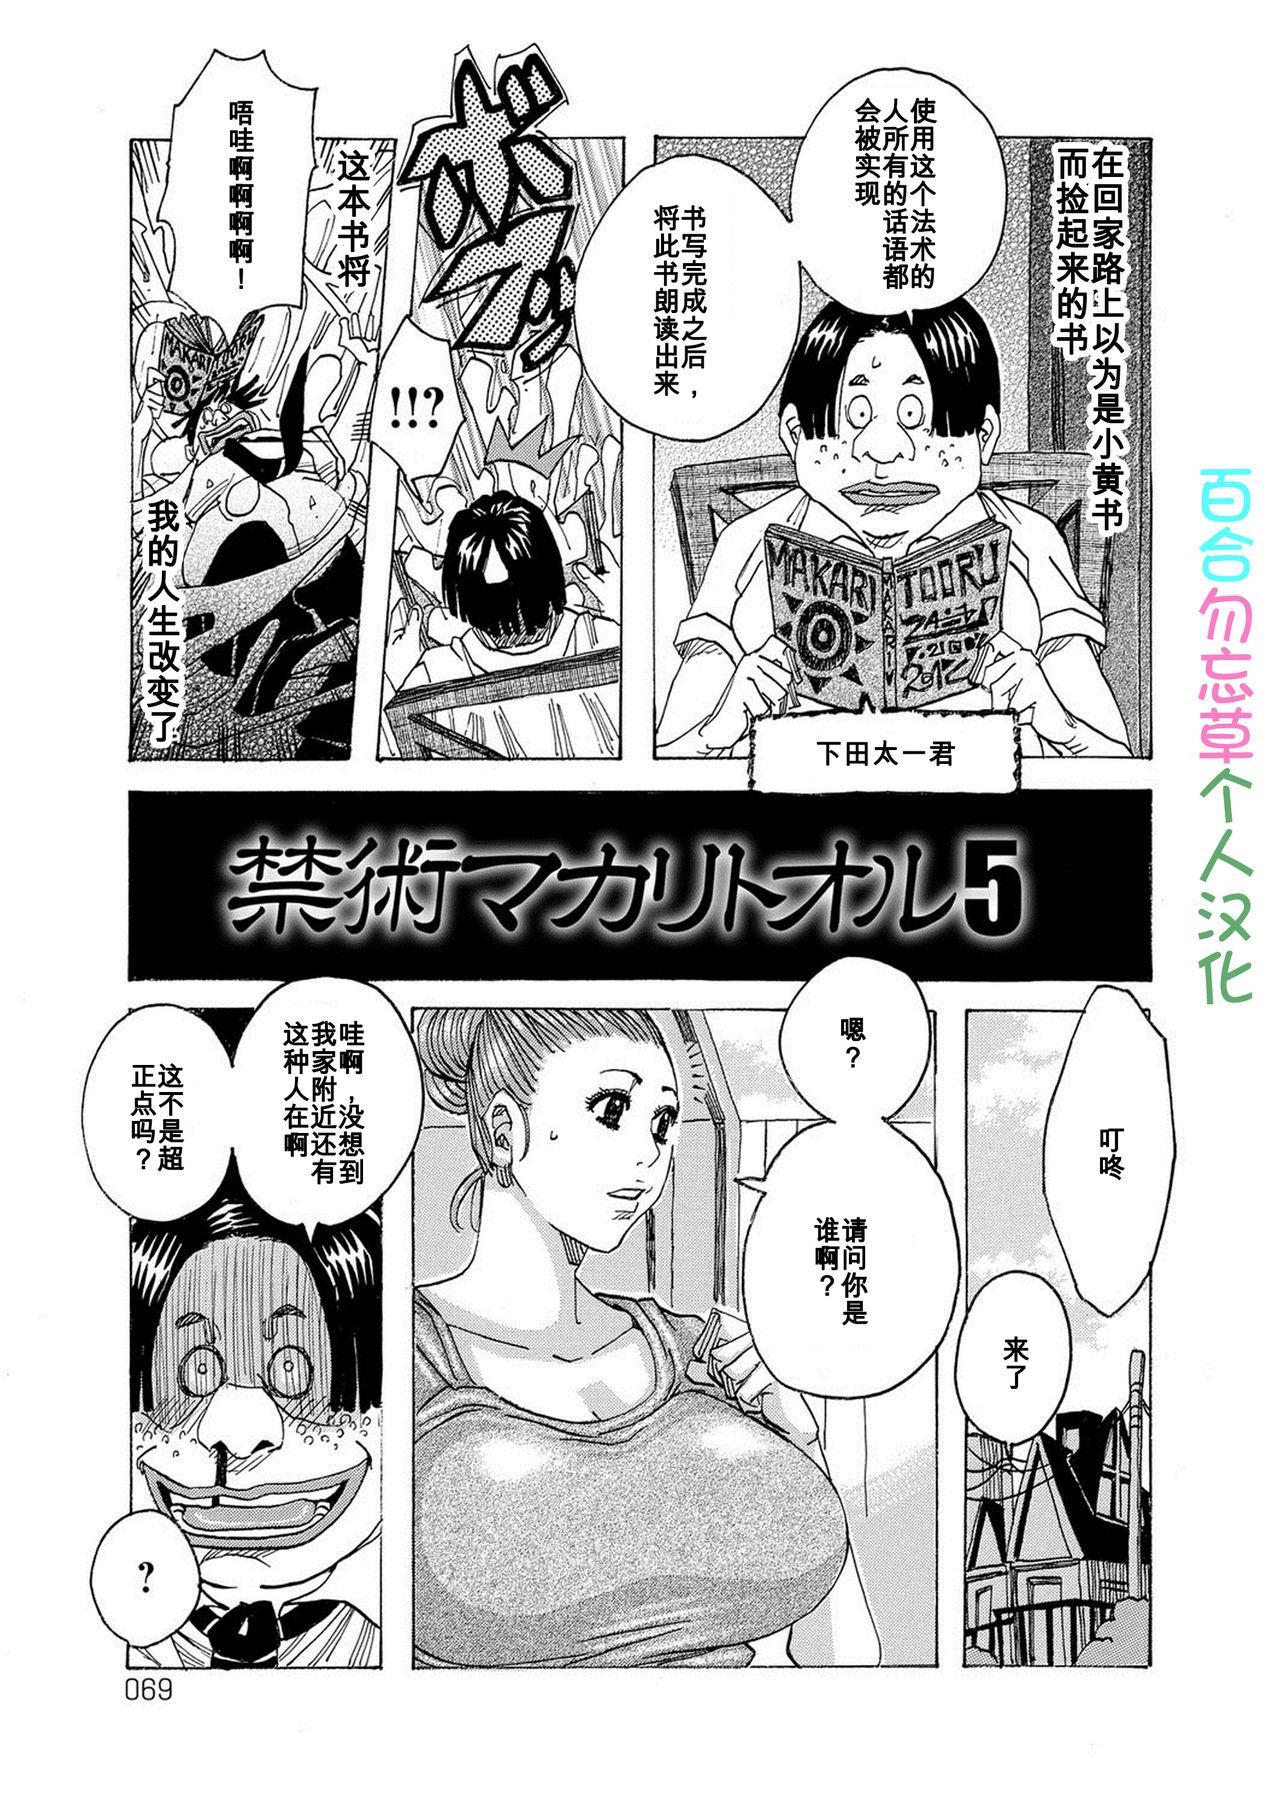 Kinjutsu Makali Tooru 5 0